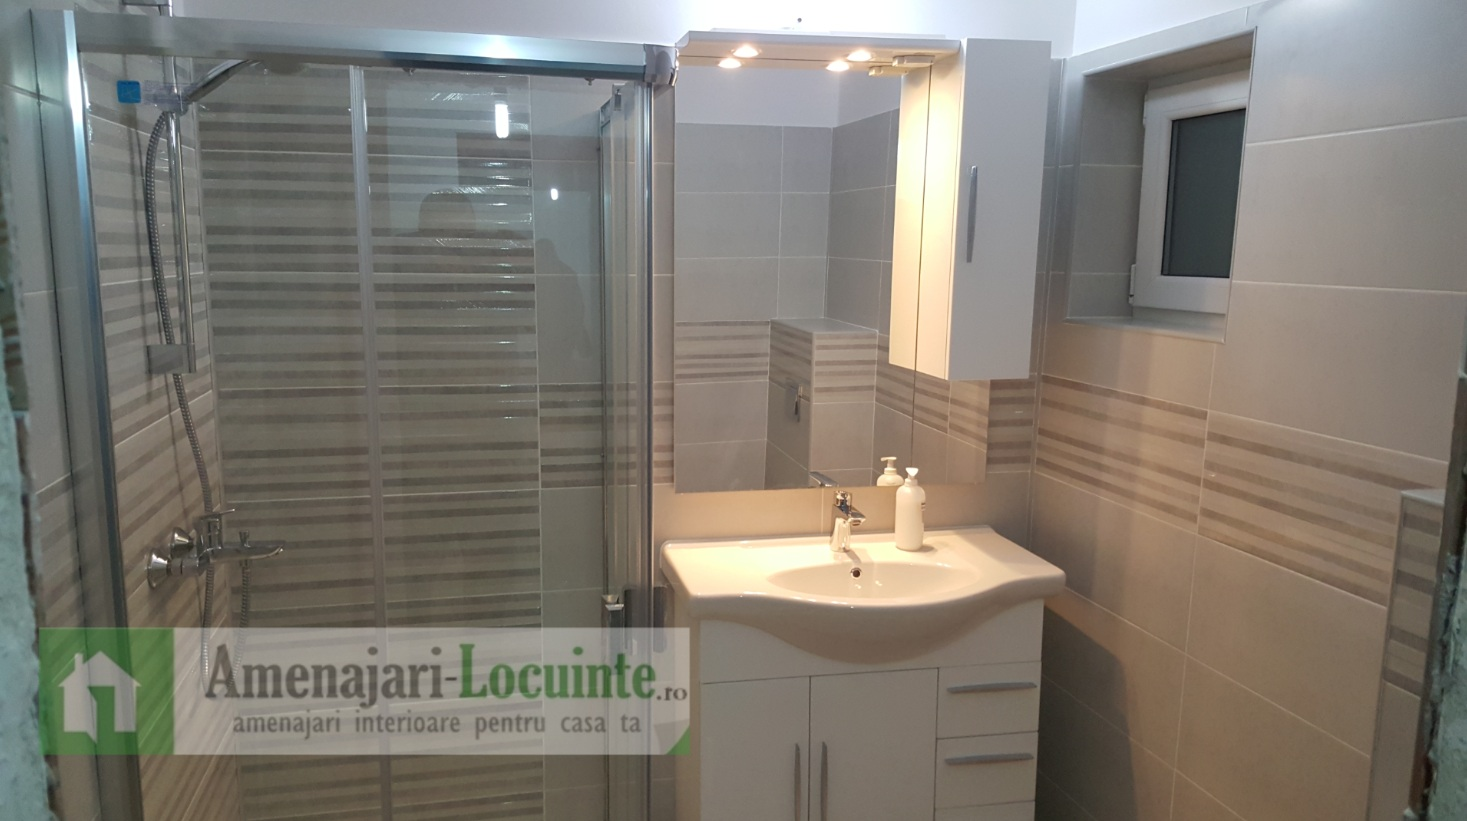 Amenajari interioare - amenajare baie